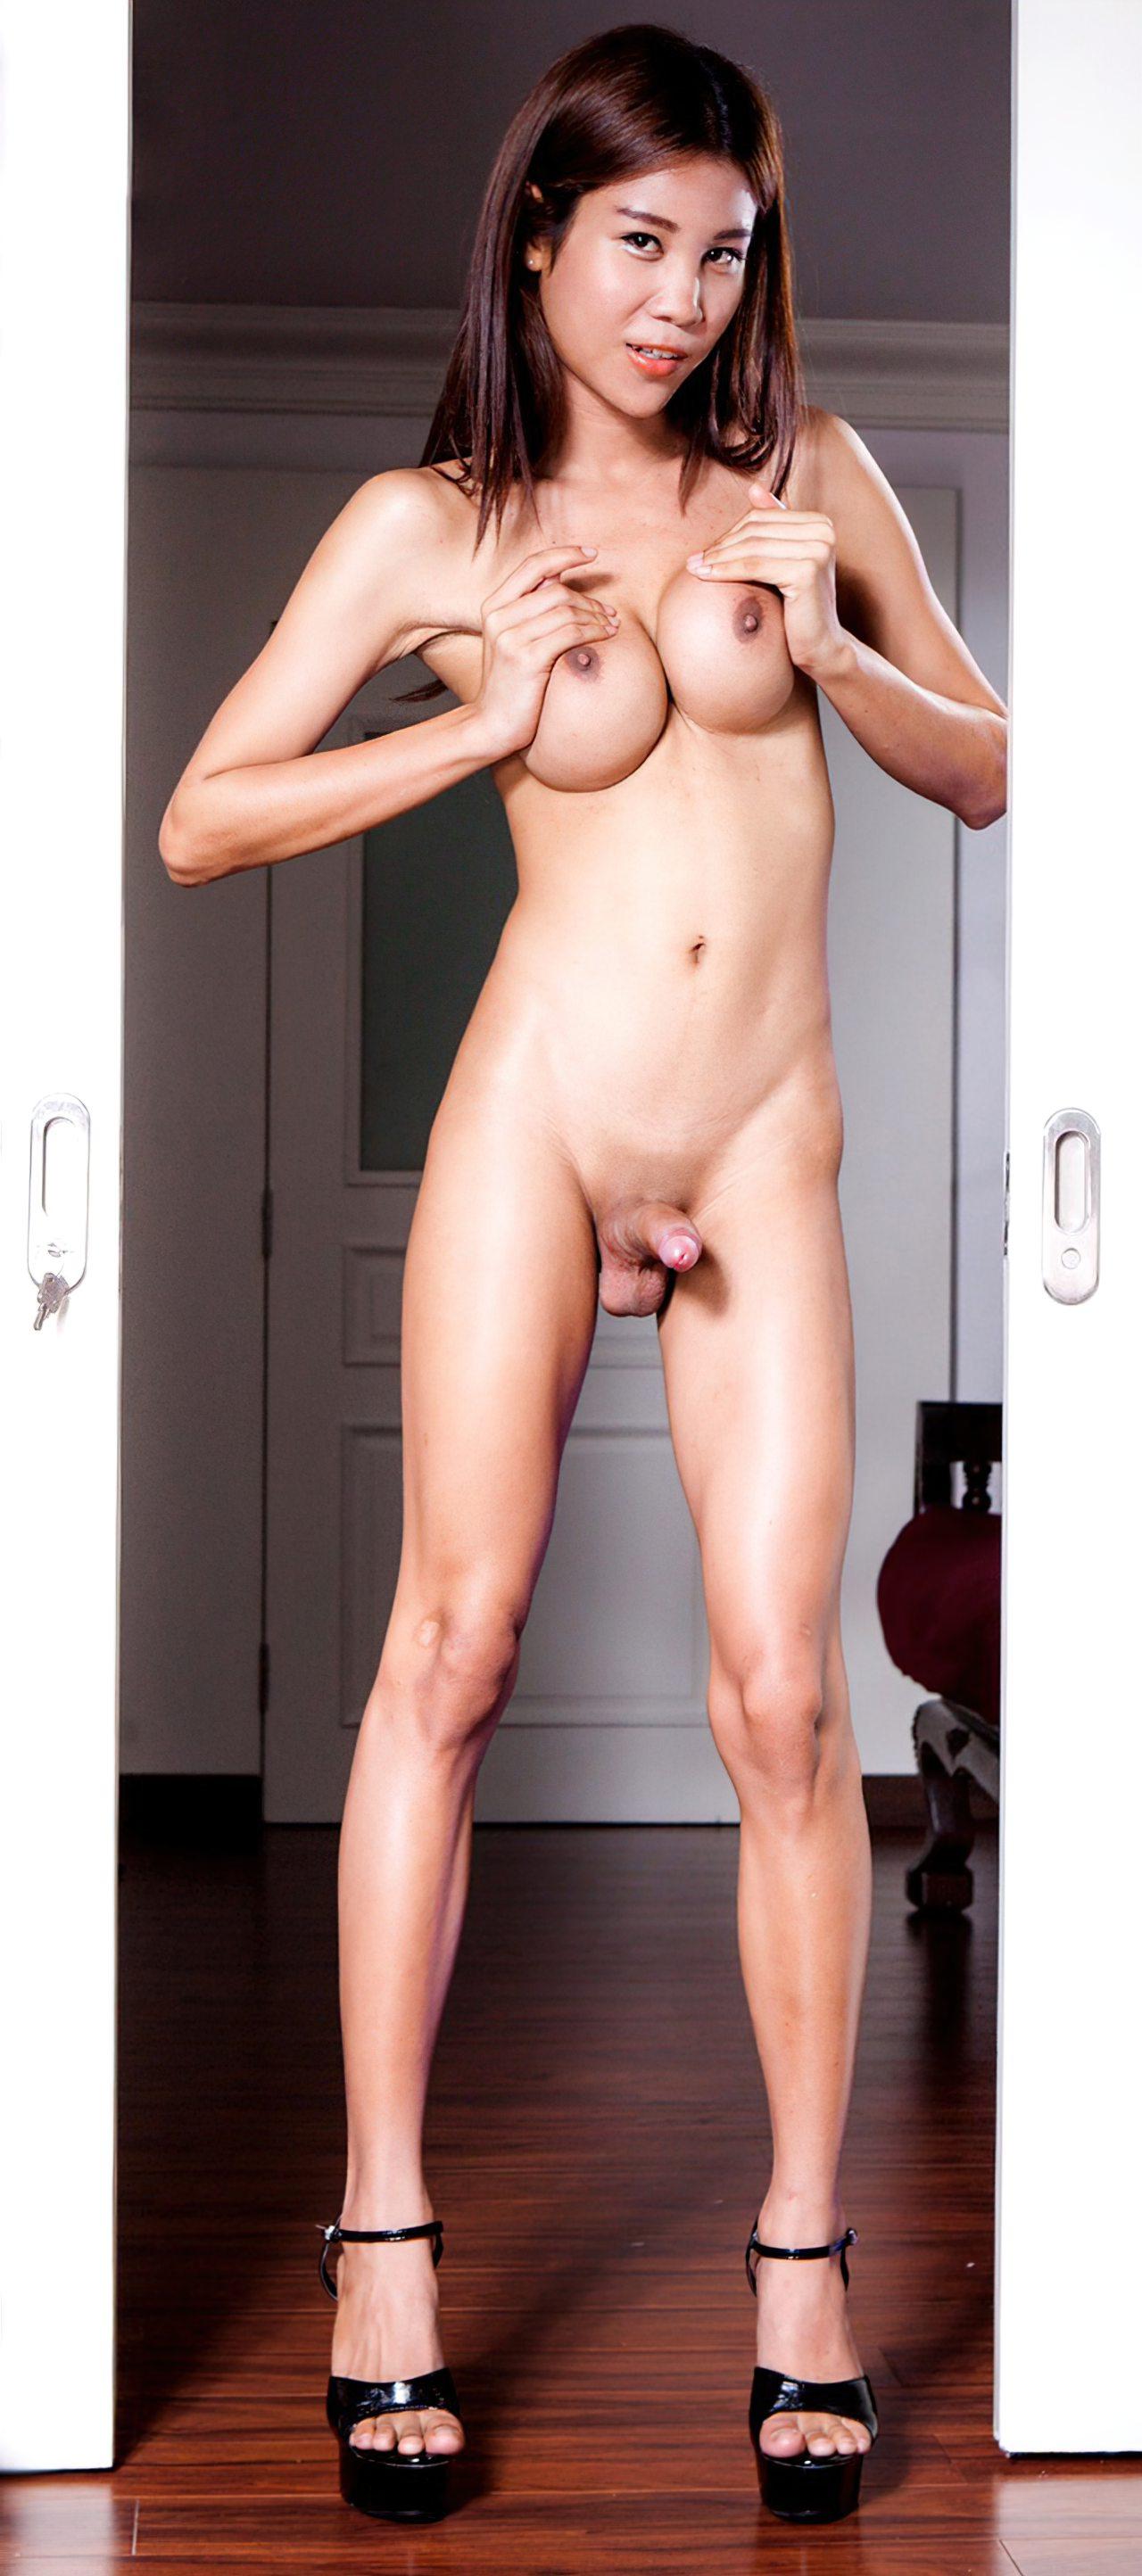 Travestis Fotos Nuas (5)